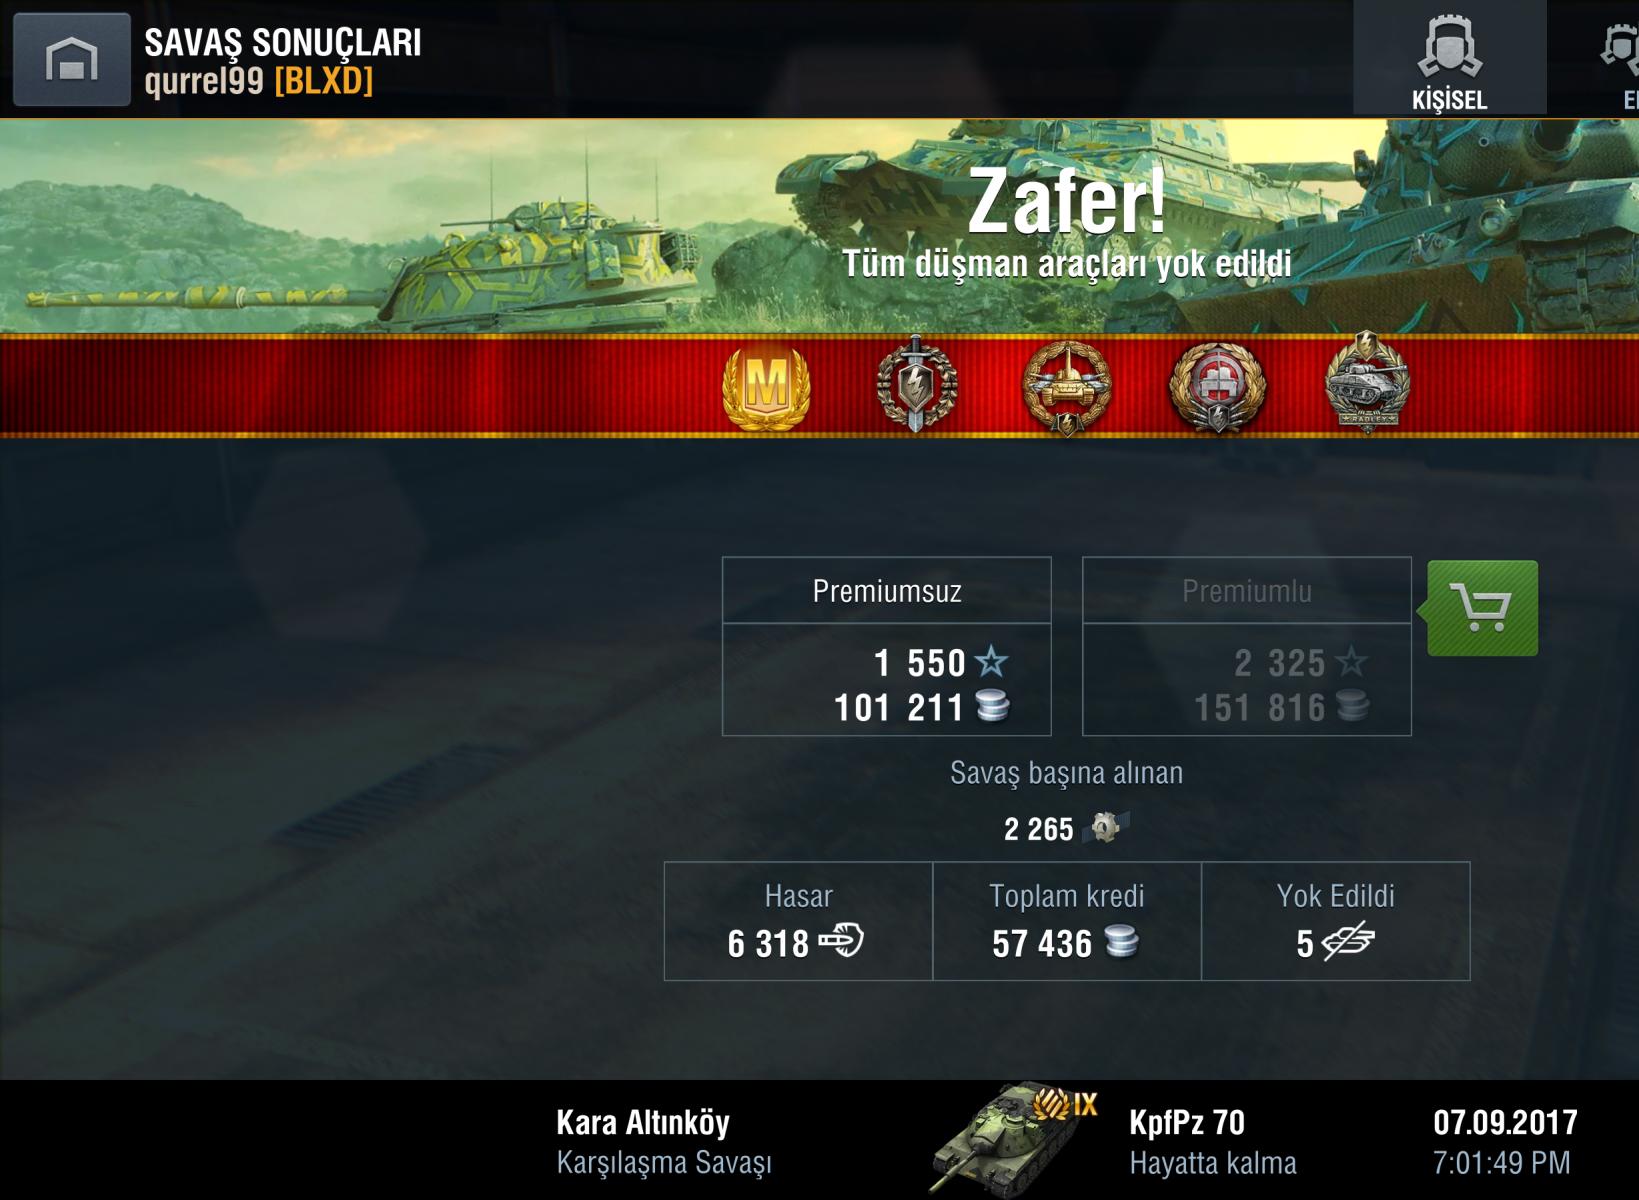 lets talk kpz 70 - gameplay - world of tanks blitz official forum